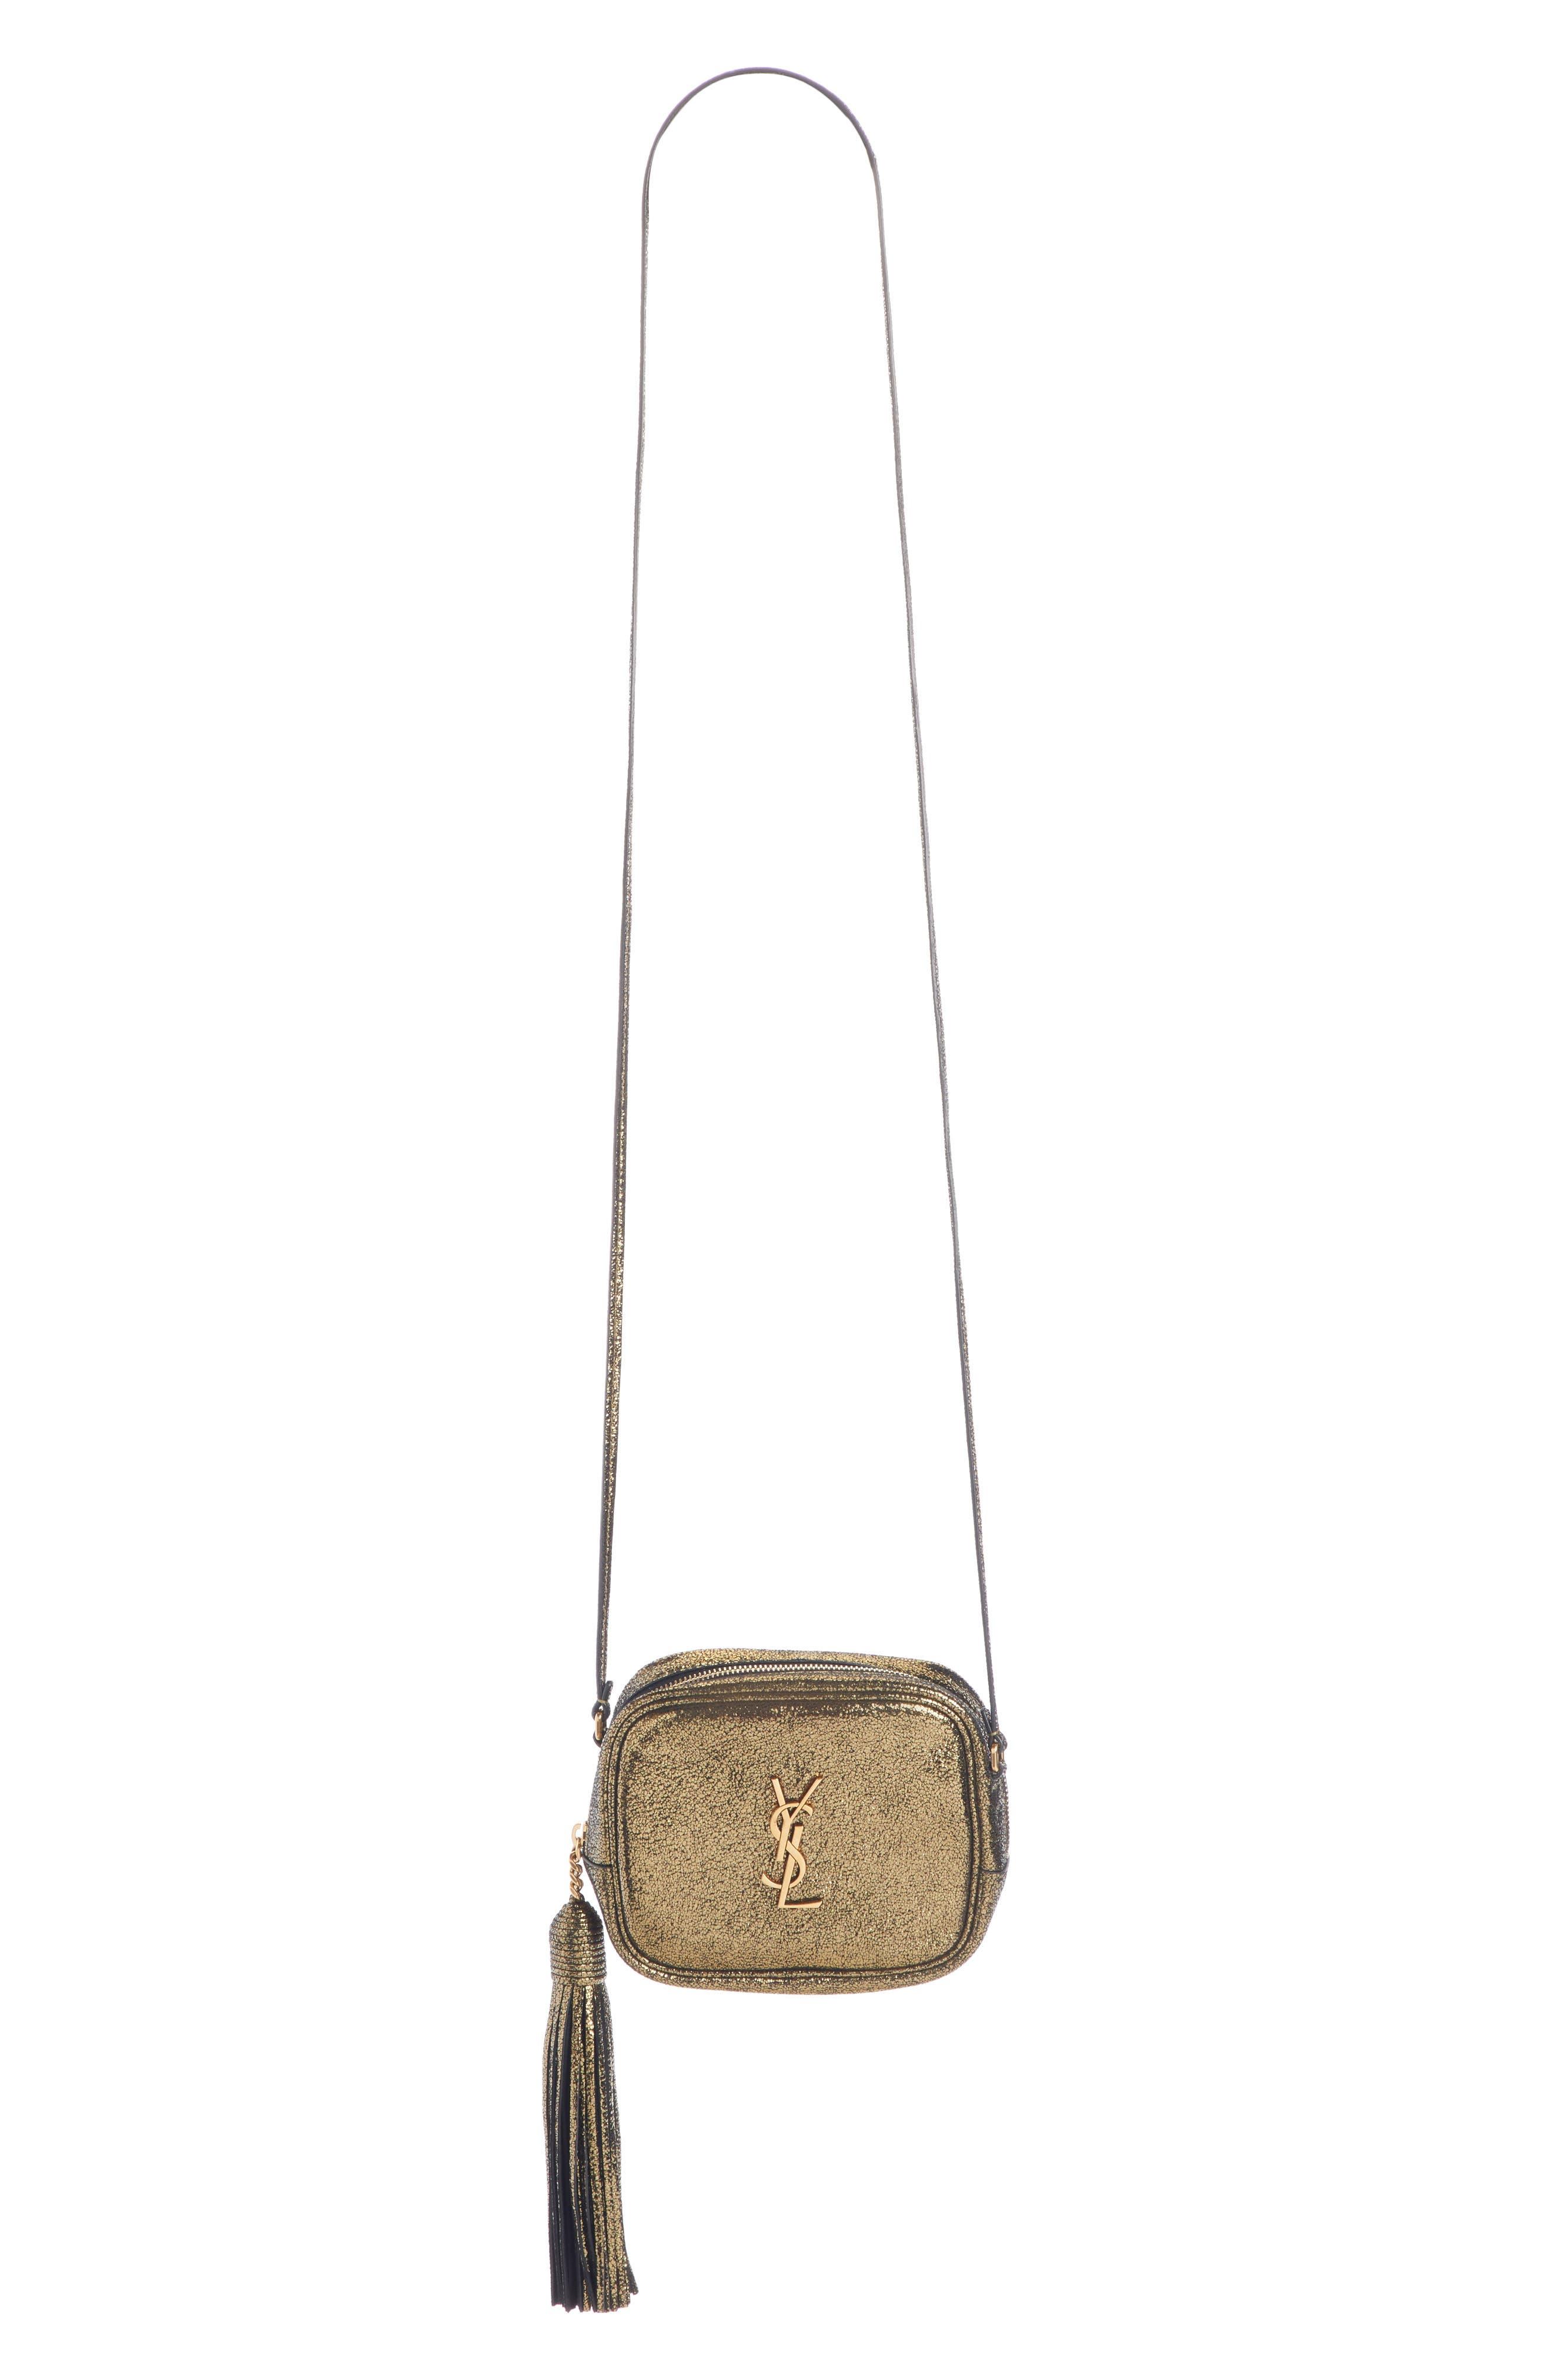 Mini Blogger Metallic Crackled Leather Crossbody Bag - Metallic in Dark Gold/ Noir